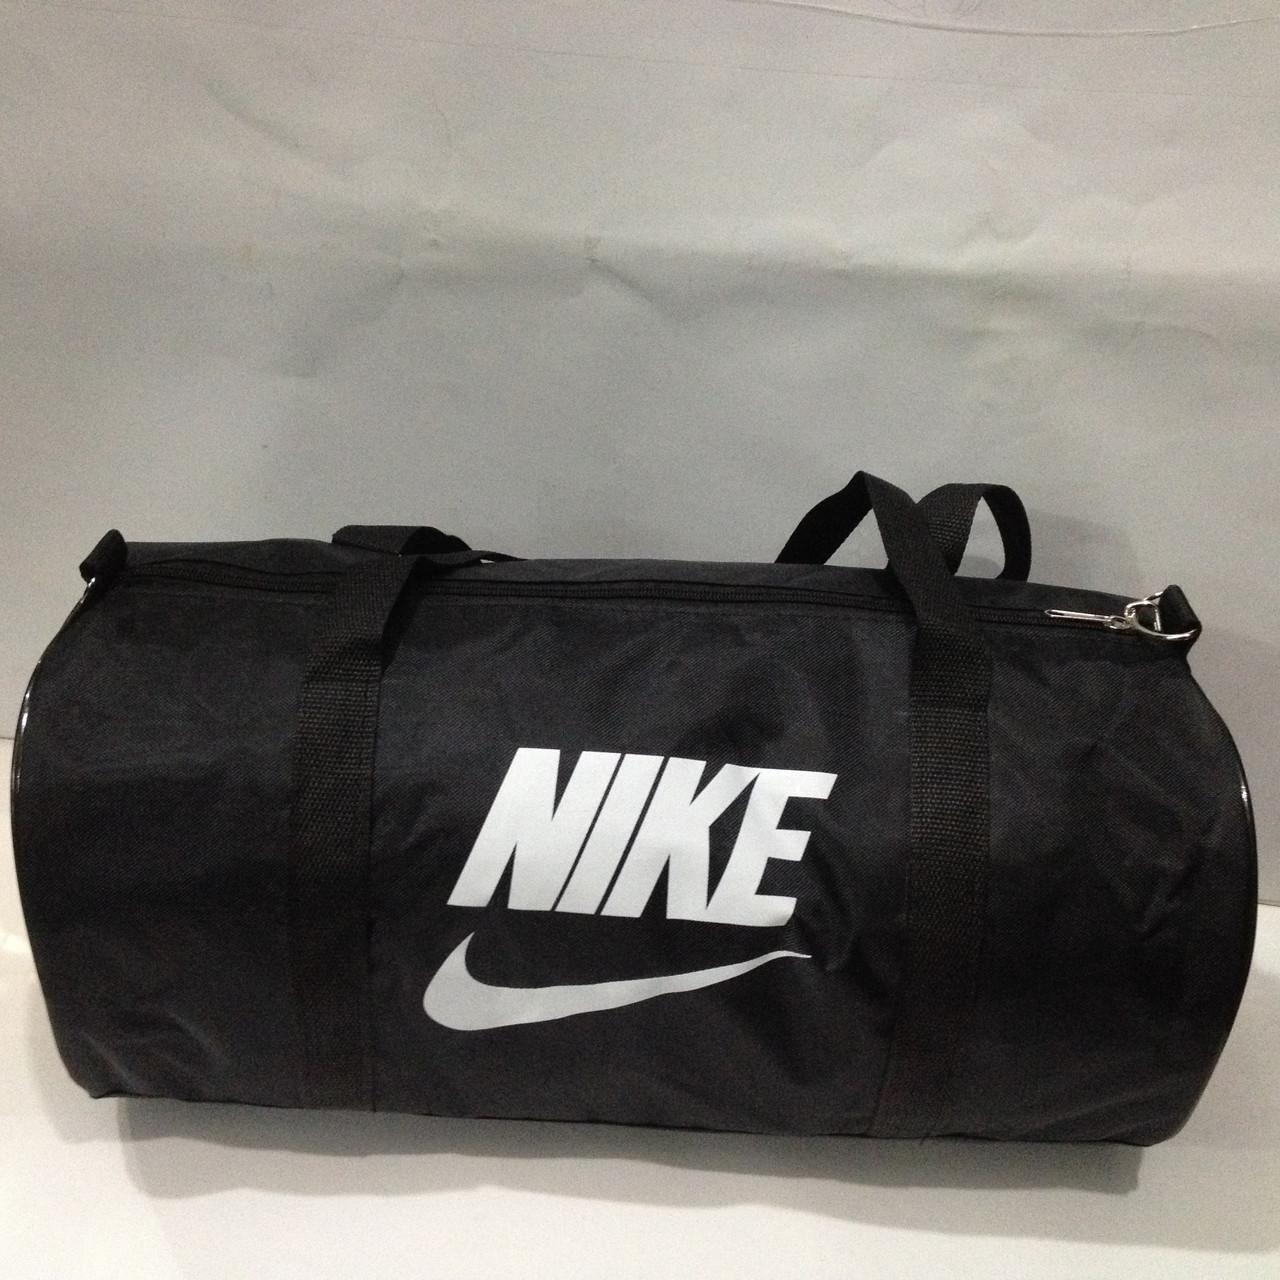 3749ae45 Спортивная дорожная сумка Nike черная белая оптом : продажа, цена в ...